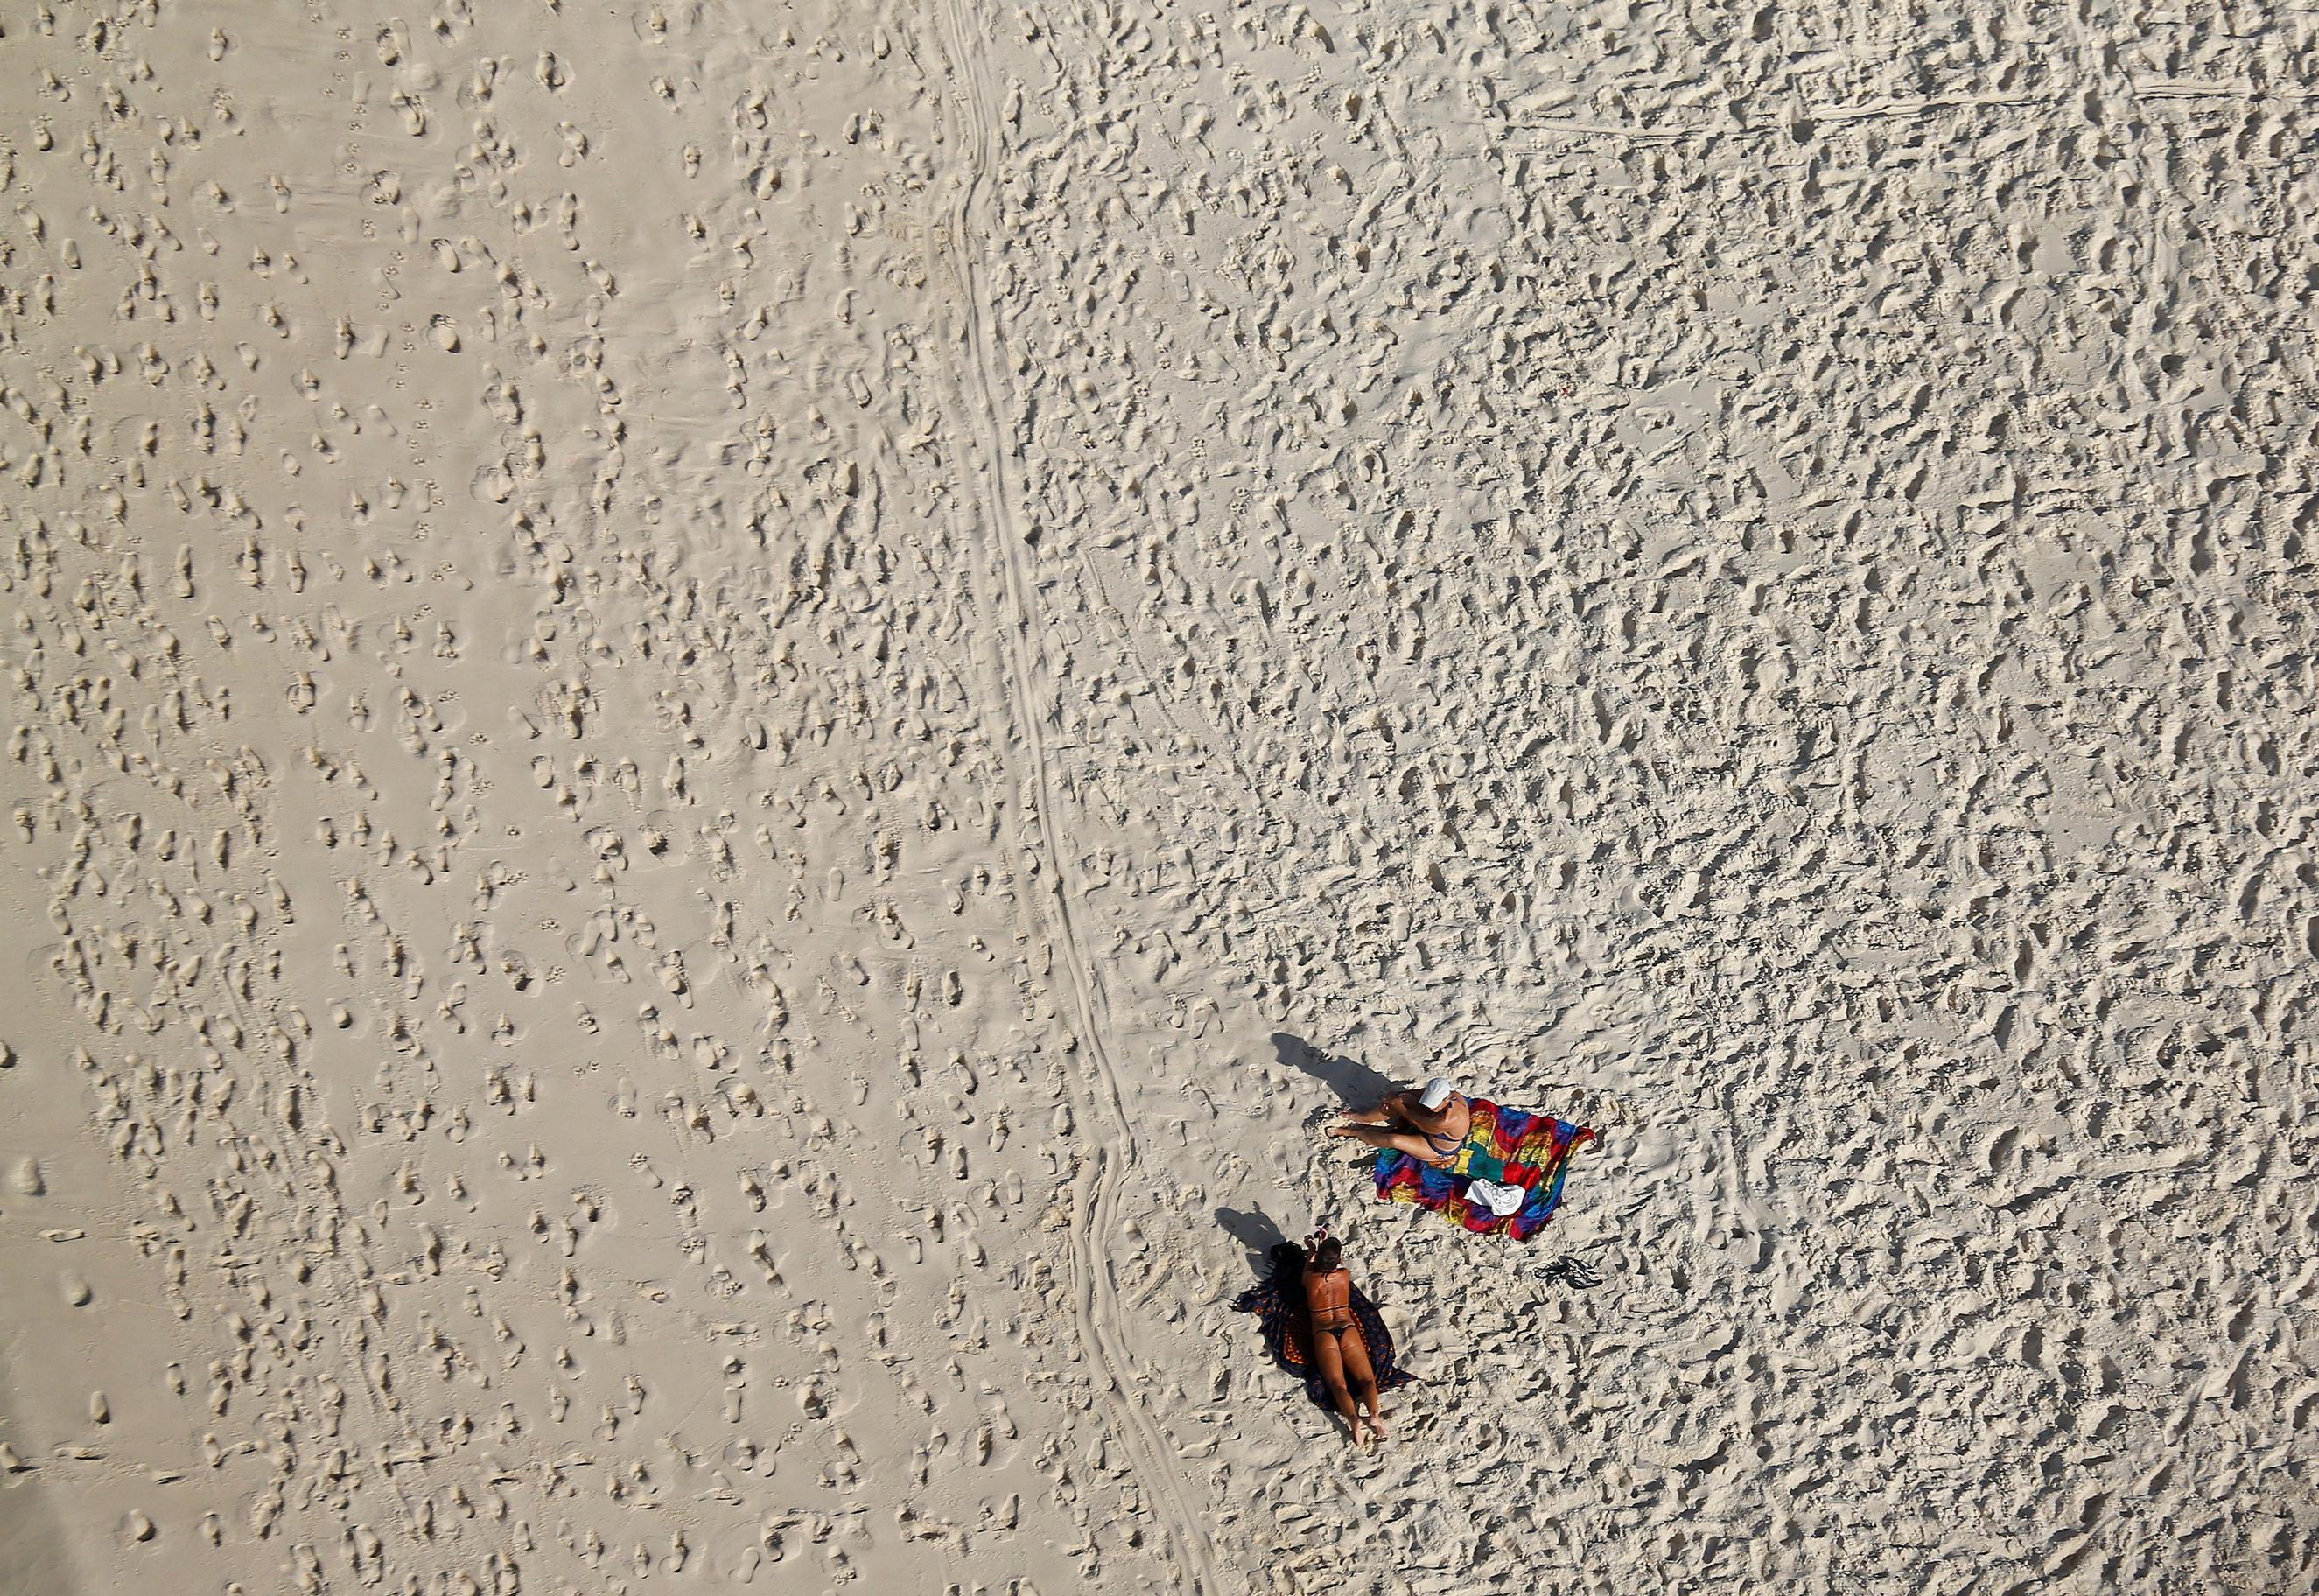 An aerial view shows people on Barra da Tijuca beach in Rio de Janeiro on July 16, 2016.